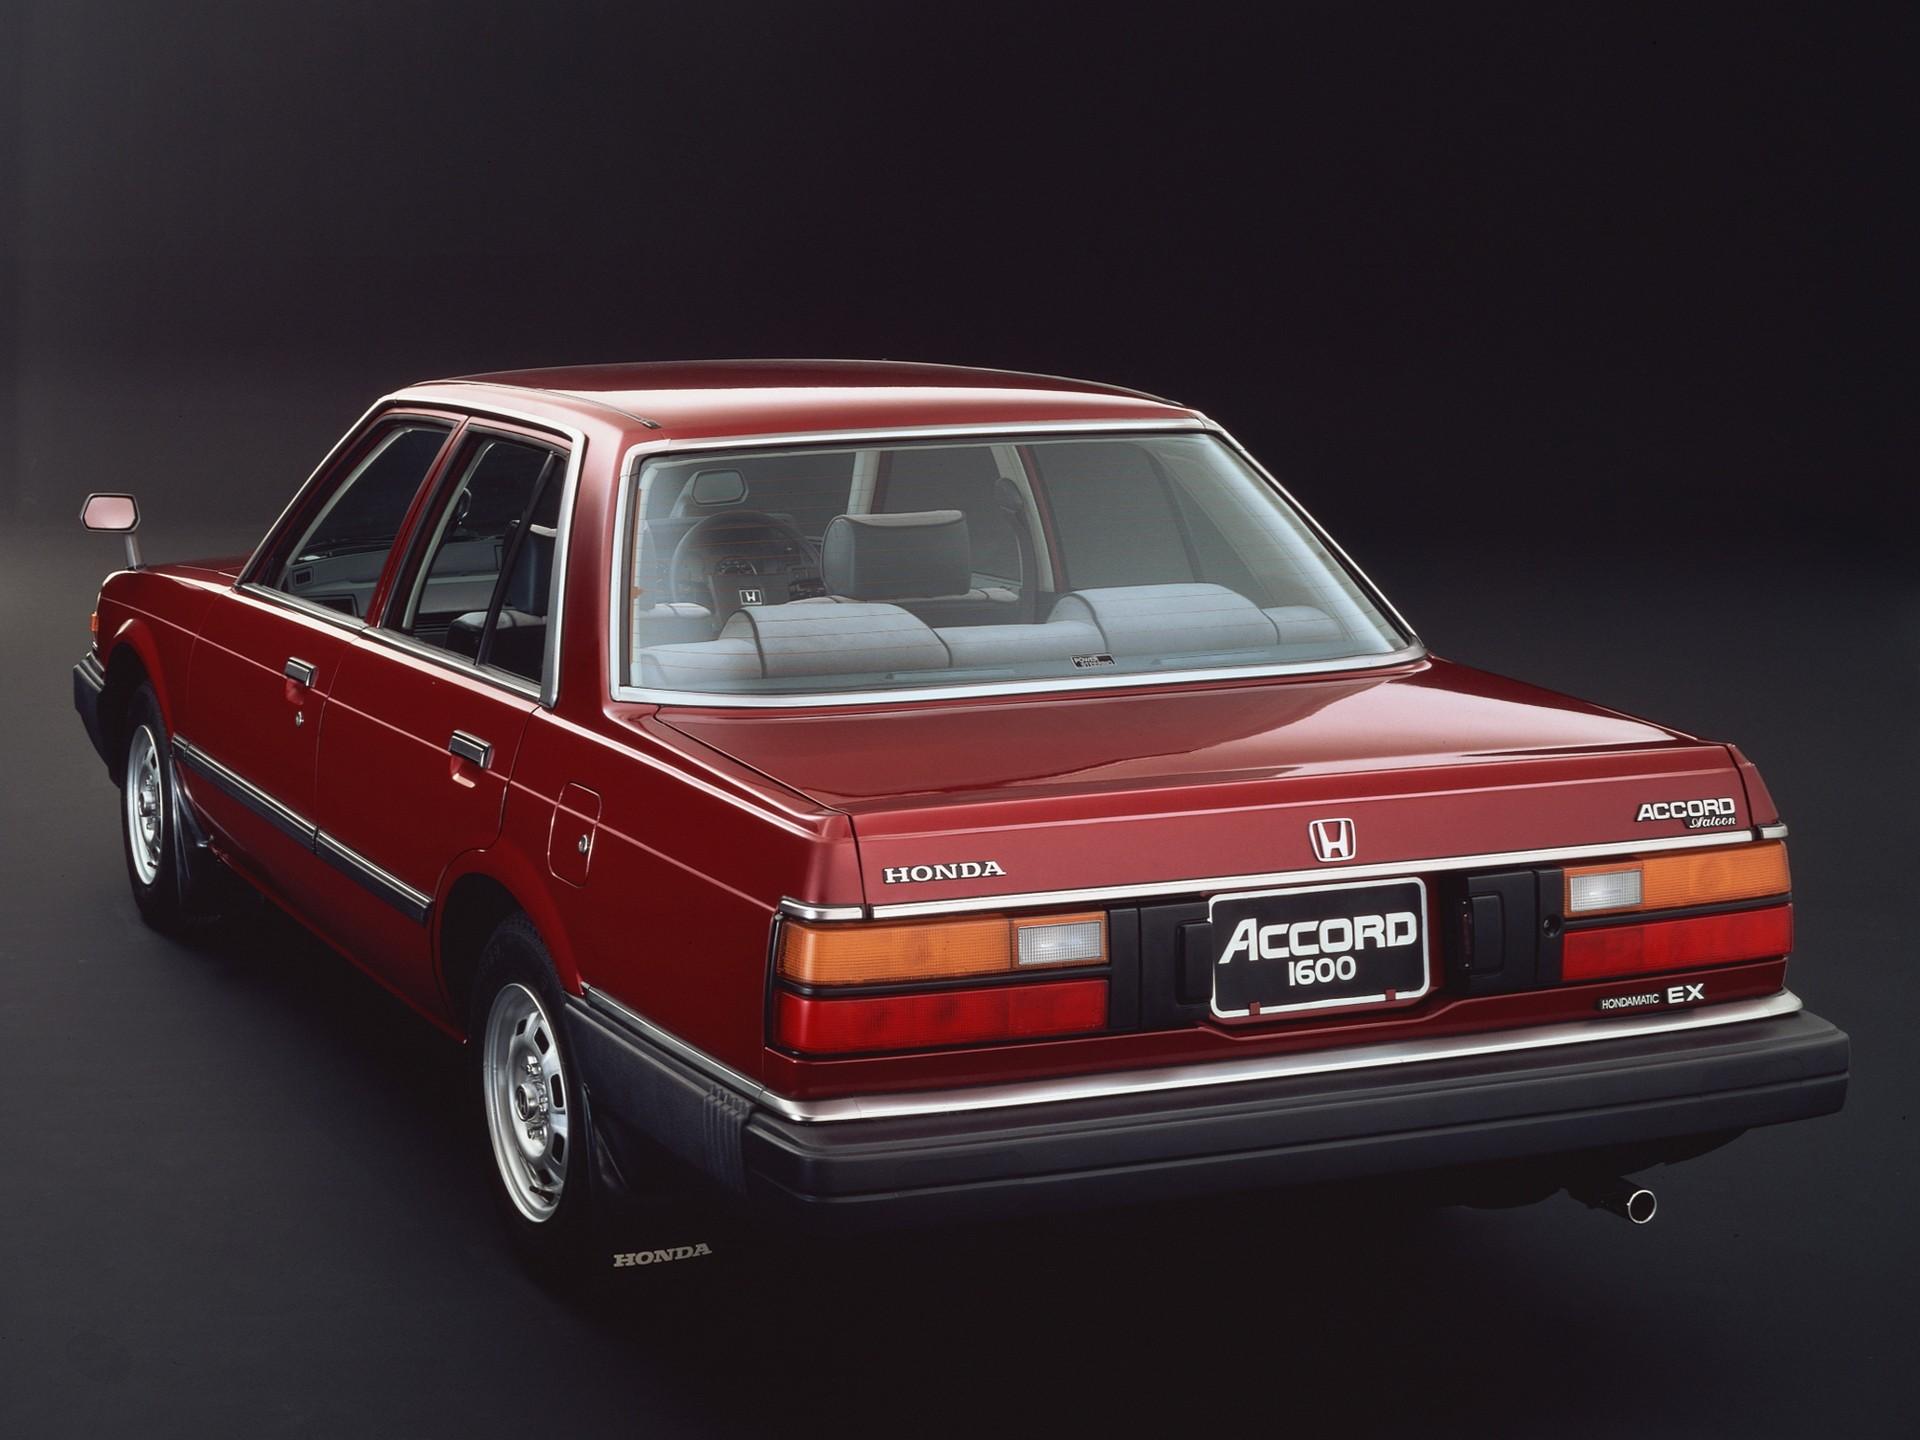 Kekurangan Honda Accord 1985 Murah Berkualitas